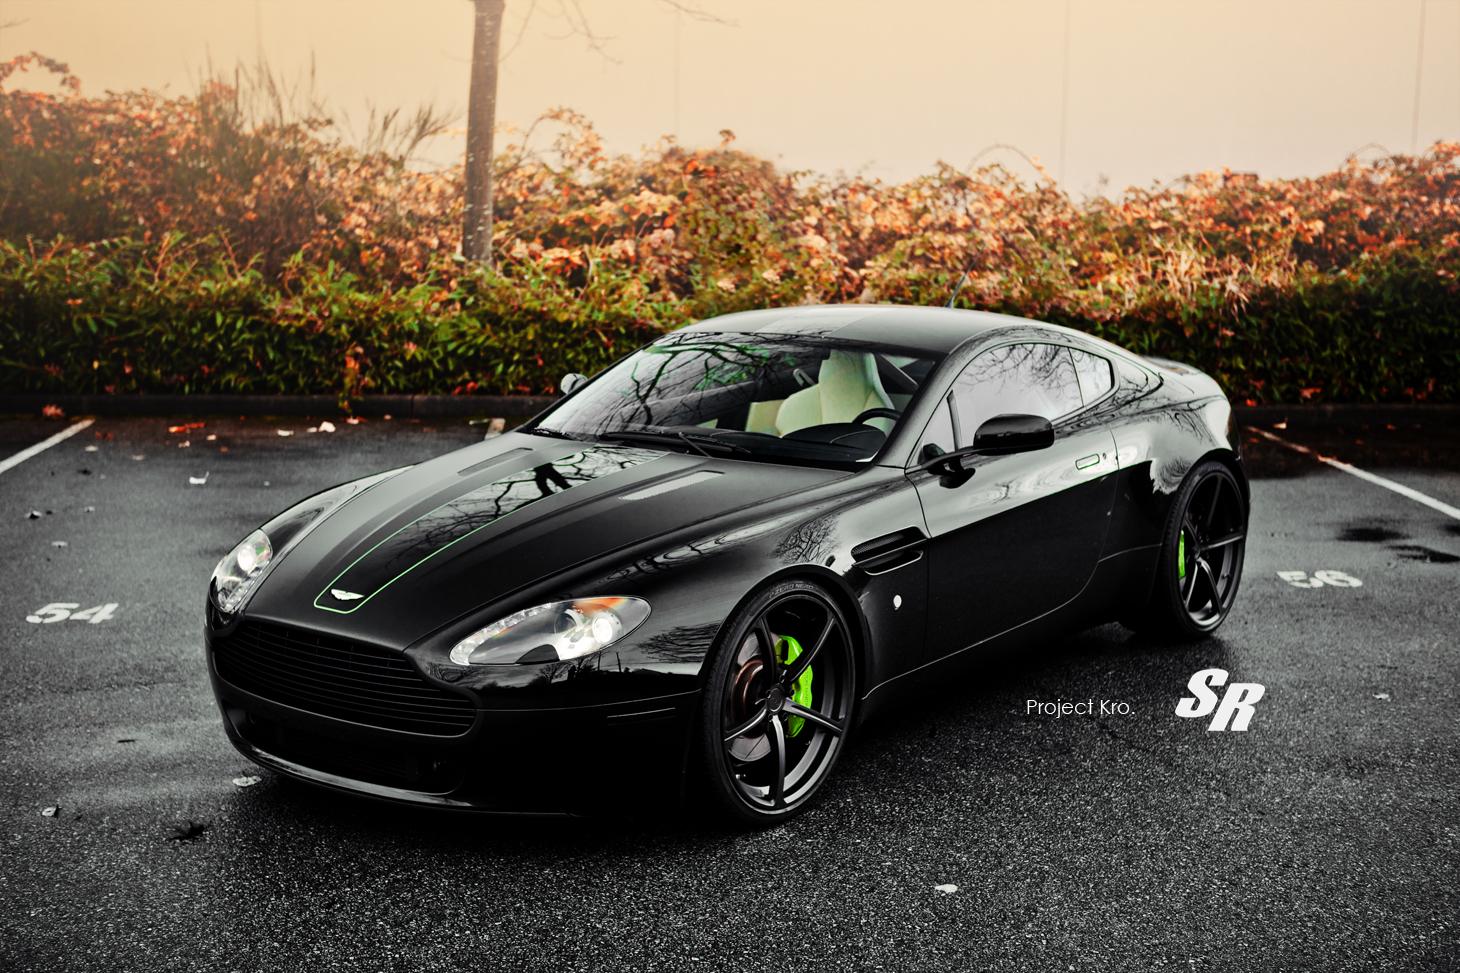 Honda Civic Lime Green Aston Martin Vantage Project Kro - autoevolution